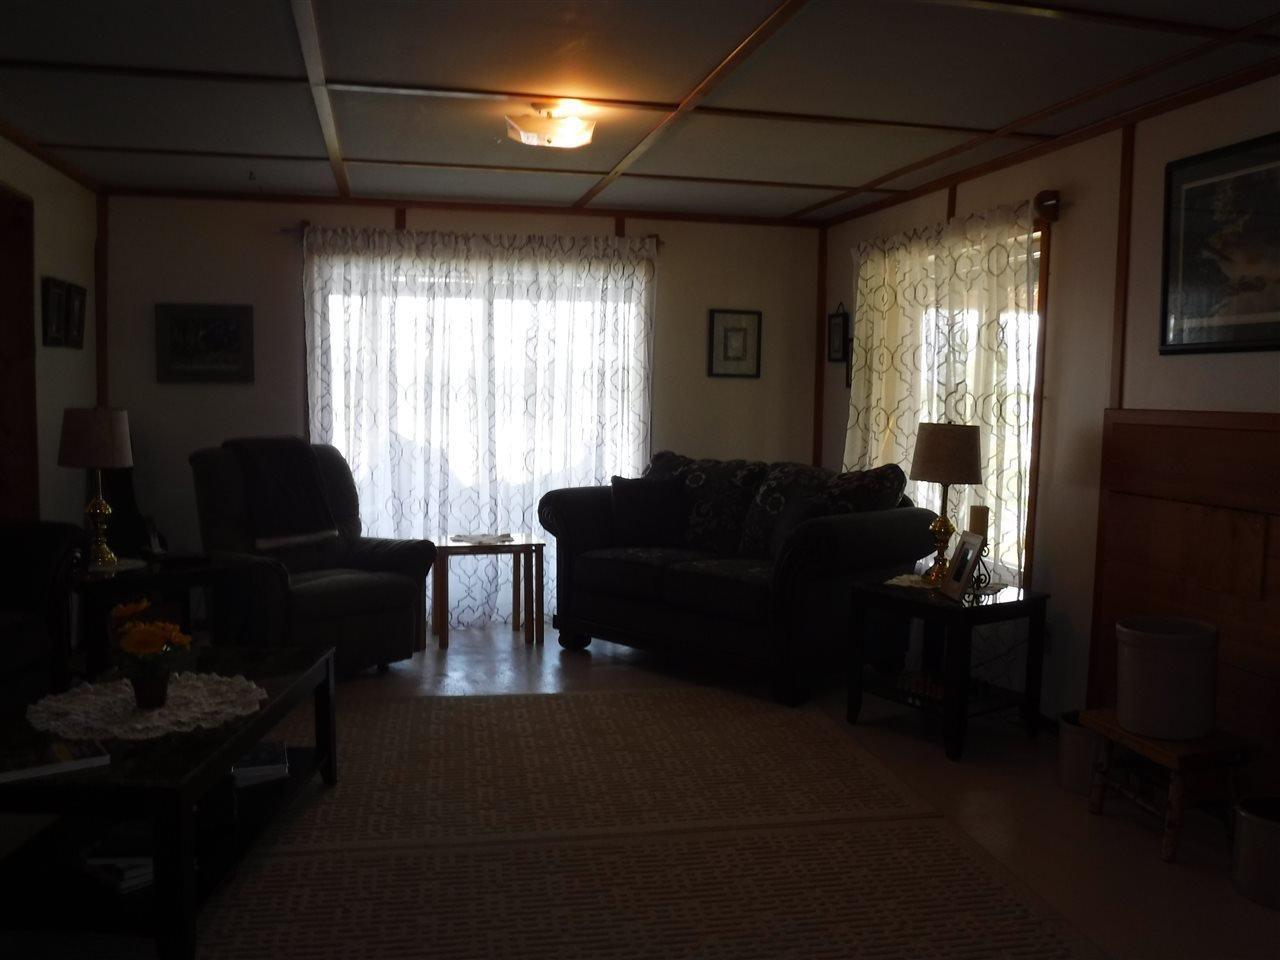 Photo 30: Photos: 3126 ELSEY Road in Williams Lake: Williams Lake - Rural West House for sale (Williams Lake (Zone 27))  : MLS®# R2467730